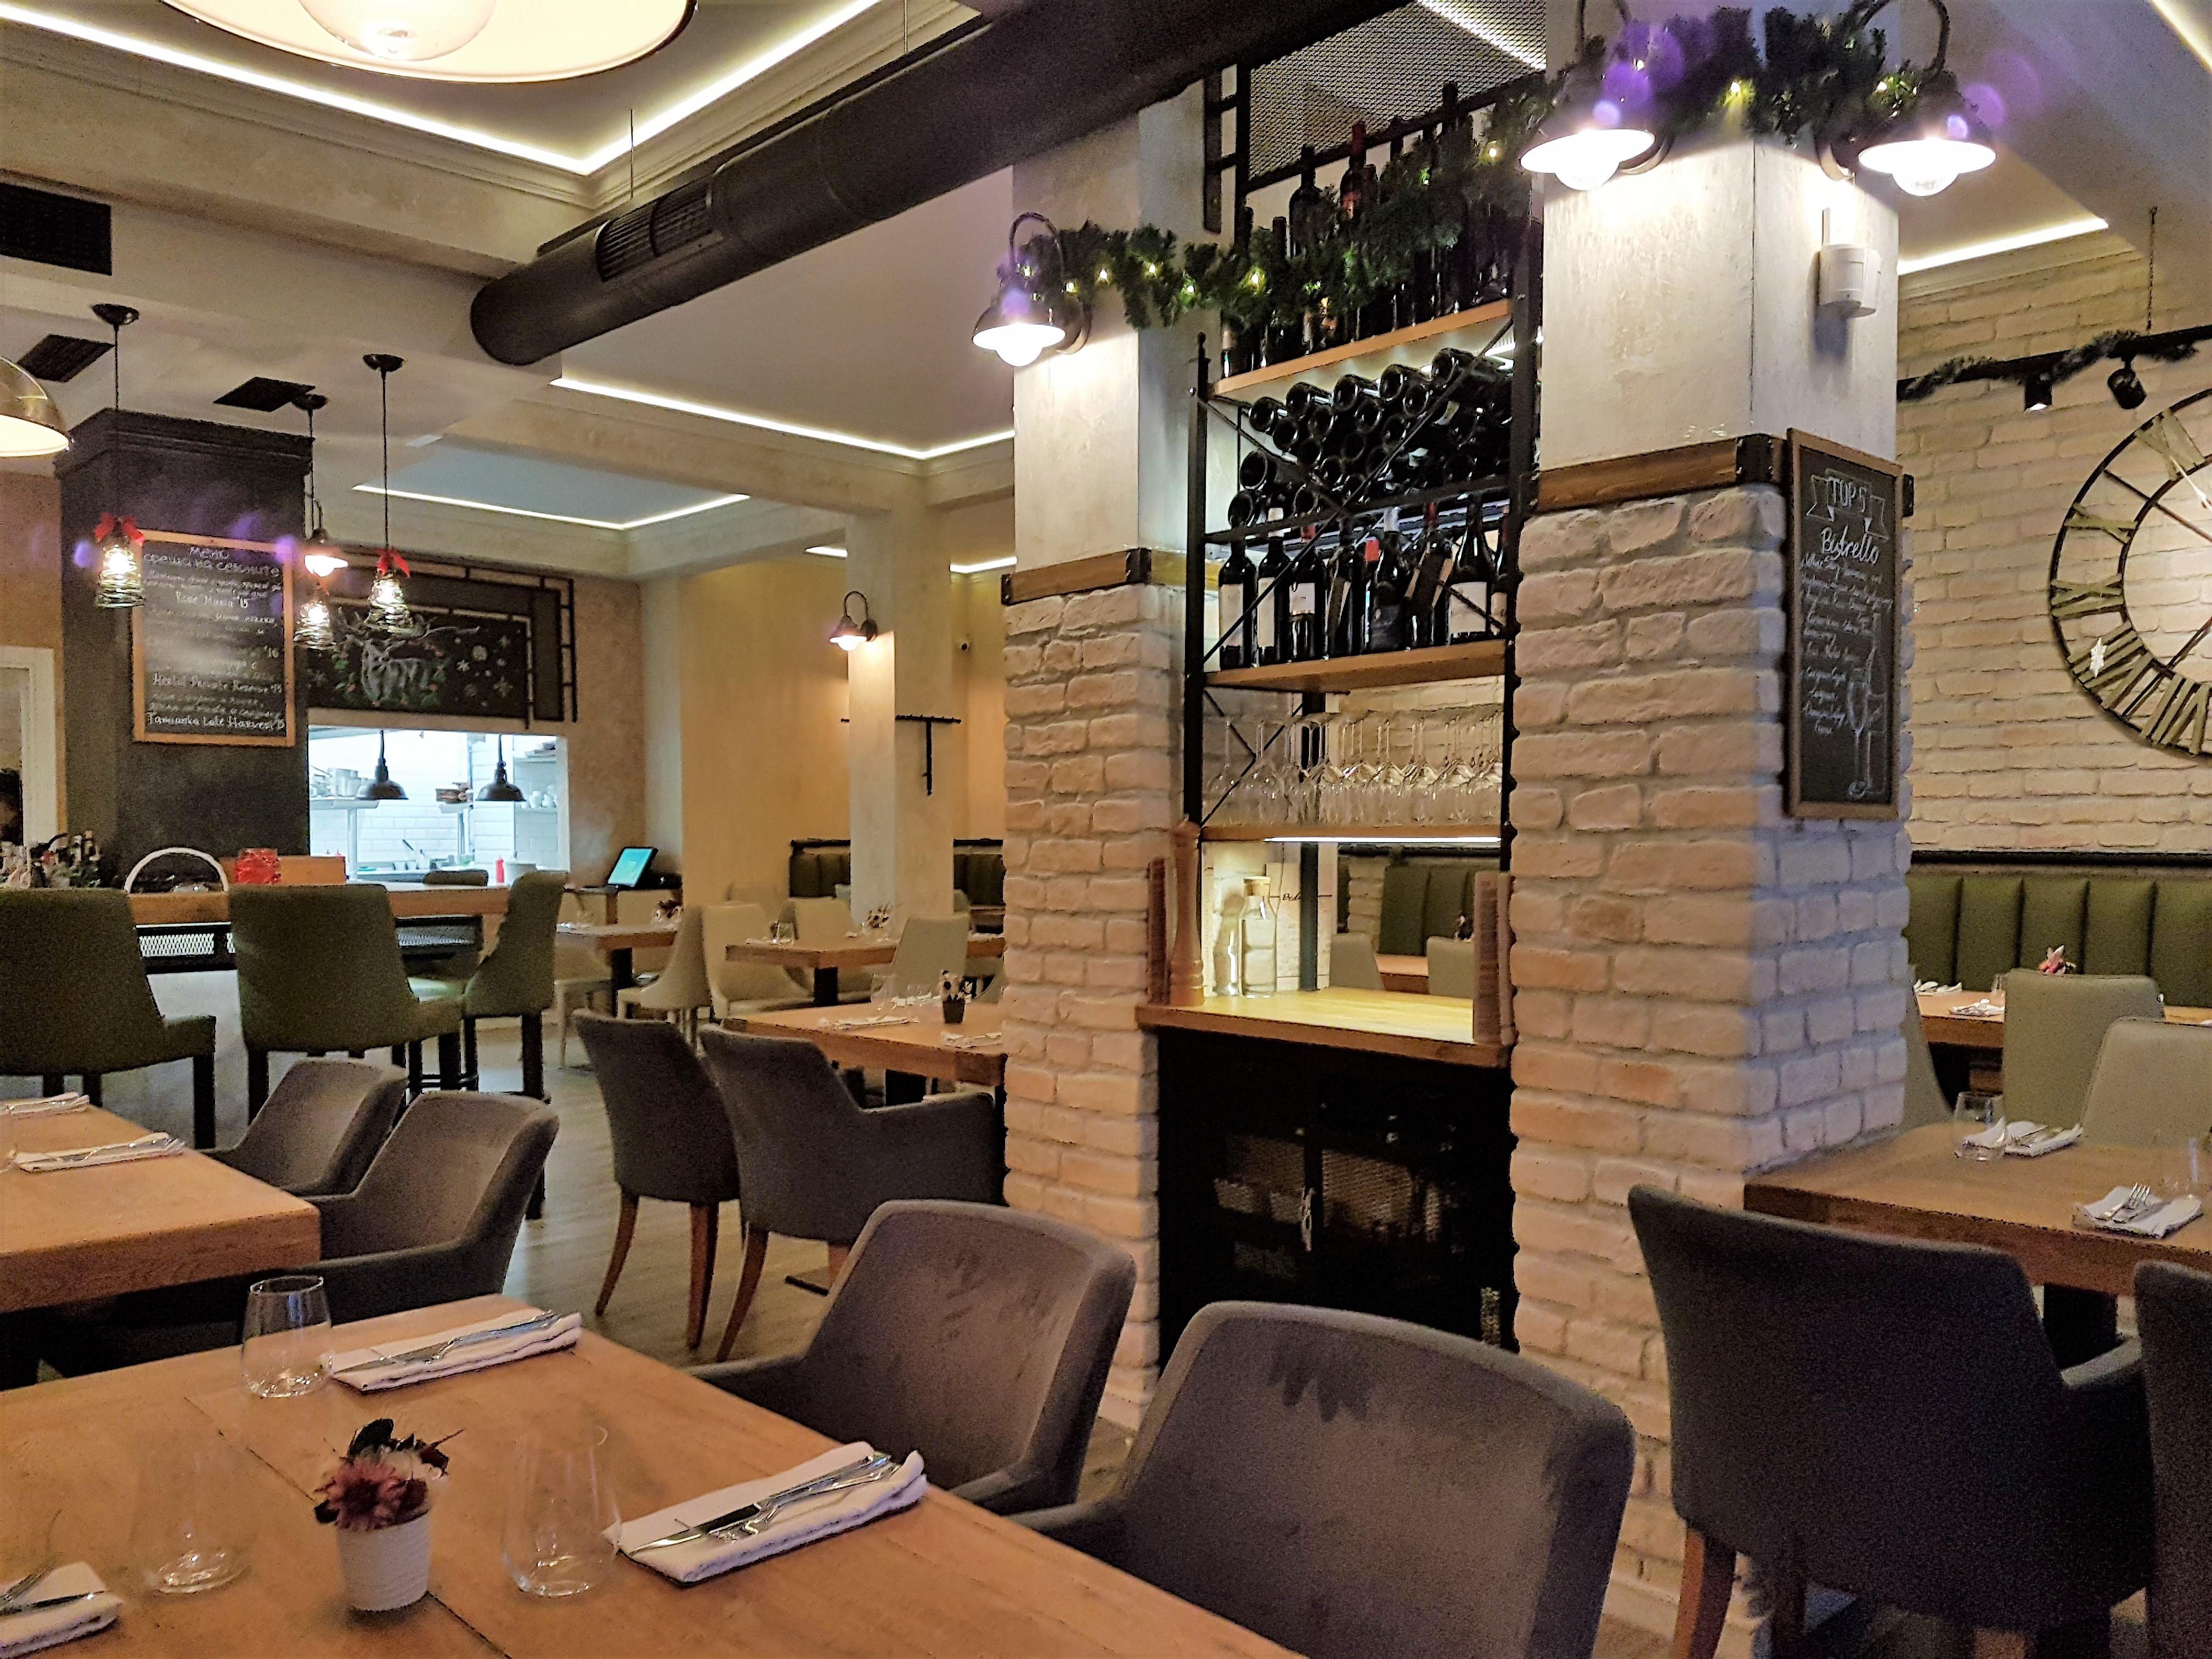 Bistrello Interior by placescases.com